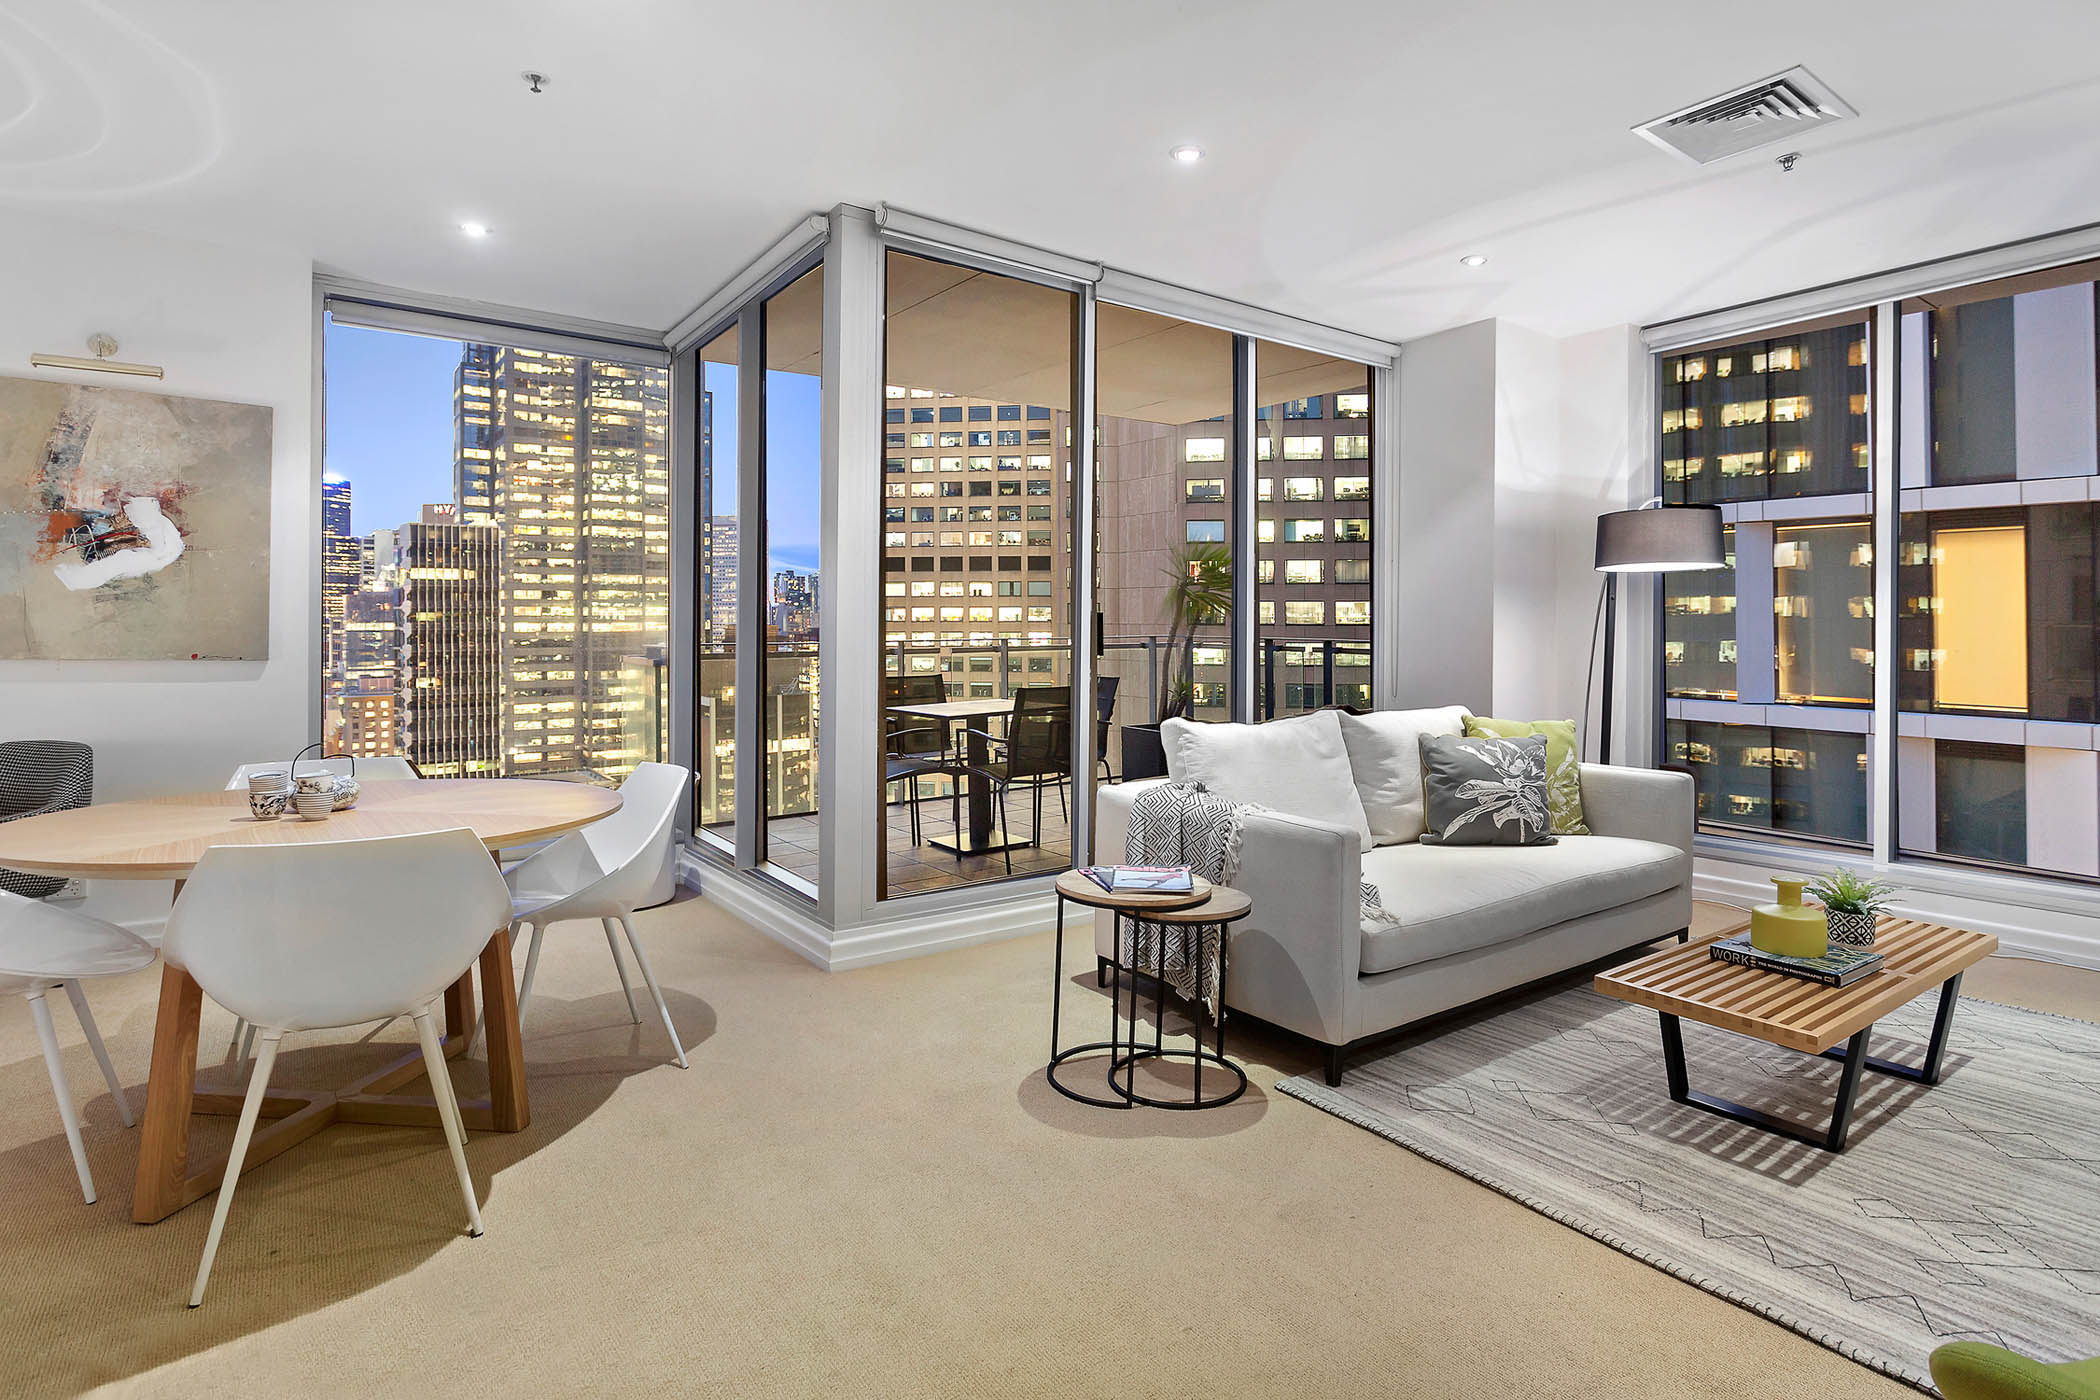 1804-31-spring-street-melbourne-student-accommodation-Melbourne-Living-Area-2-Unilodgers